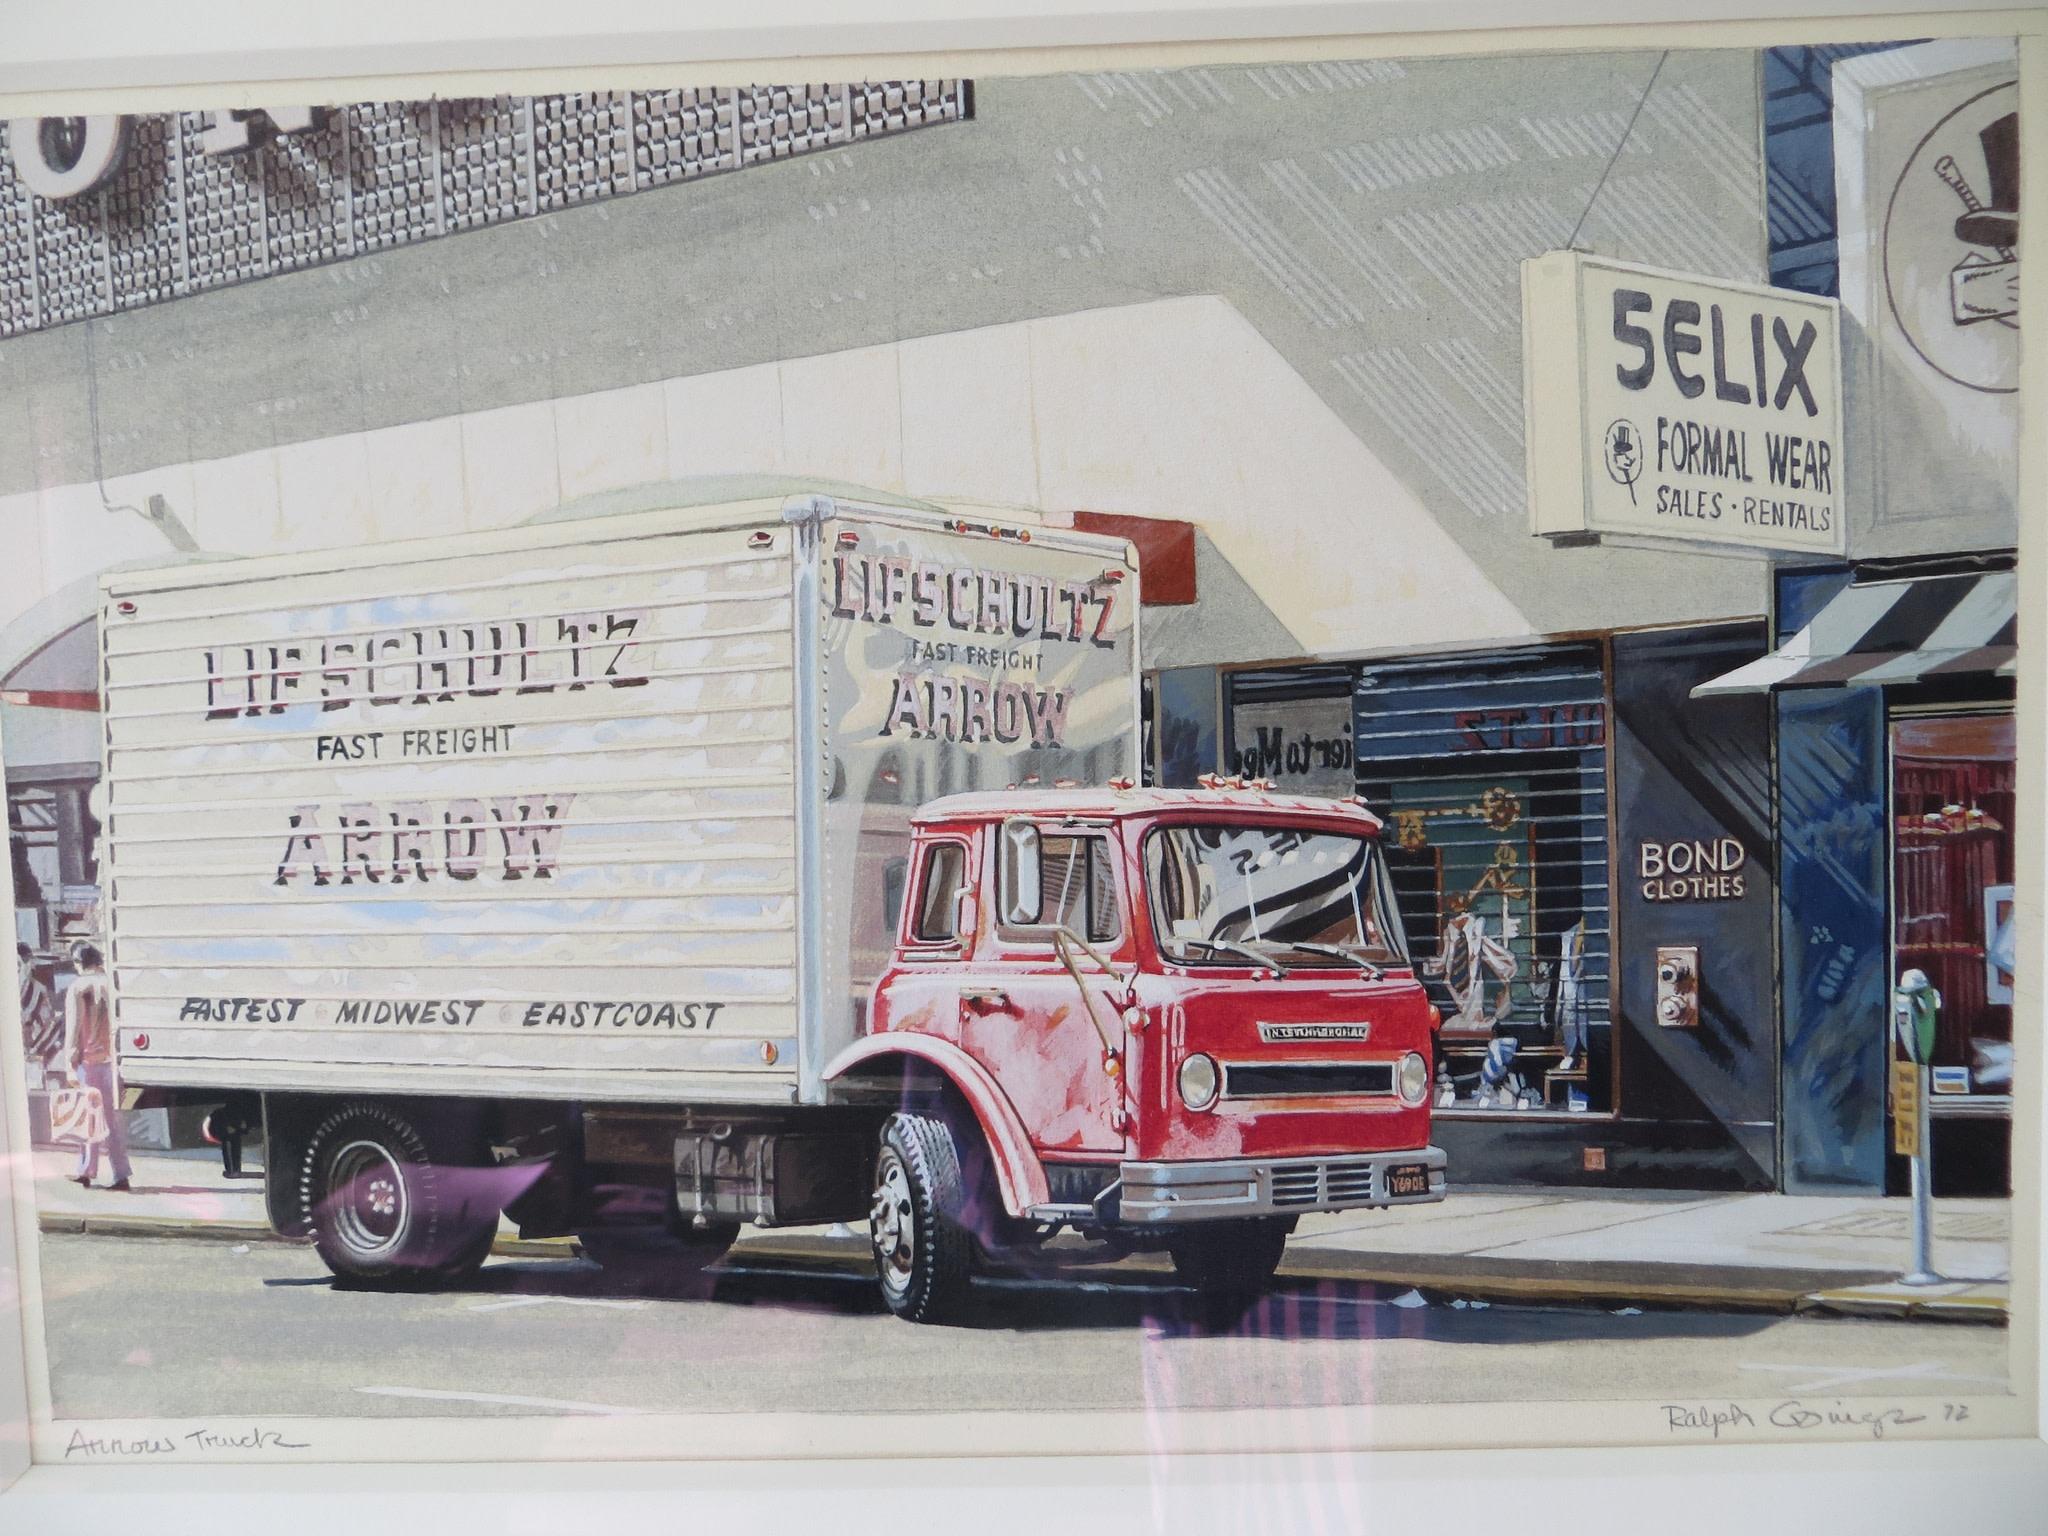 <span class=&#34;link fancybox-details-link&#34;><a href=&#34;/artists/113-ralph-goings/works/750/&#34;>View Detail Page</a></span><div class=&#34;artist&#34;><strong>Ralph Goings</strong></div> <div class=&#34;title&#34;><em>Arrow truck</em></div> <div class=&#34;medium&#34;>Watercolour</div> <div class=&#34;dimensions&#34;>23 x 30.5 cm</div>